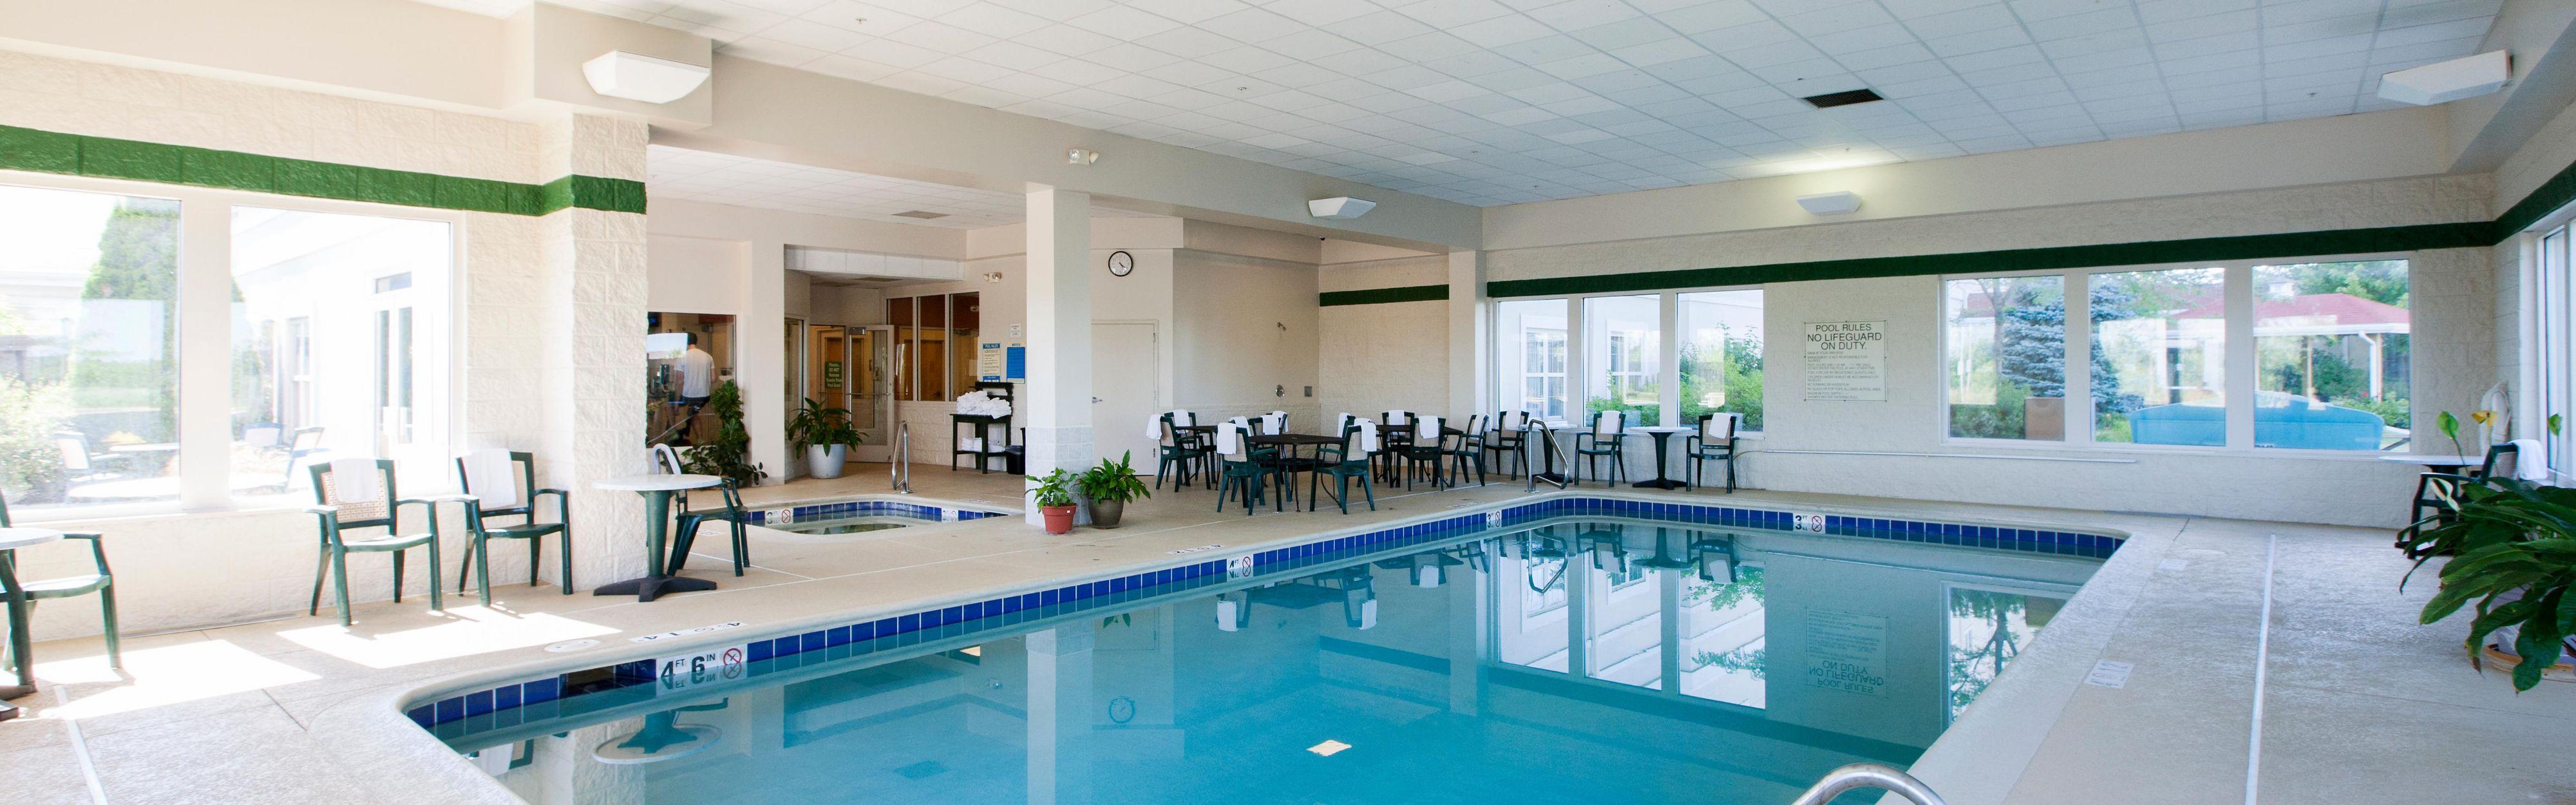 Holiday Inn Chicago-Tinley Park-Conv Ctr image 2